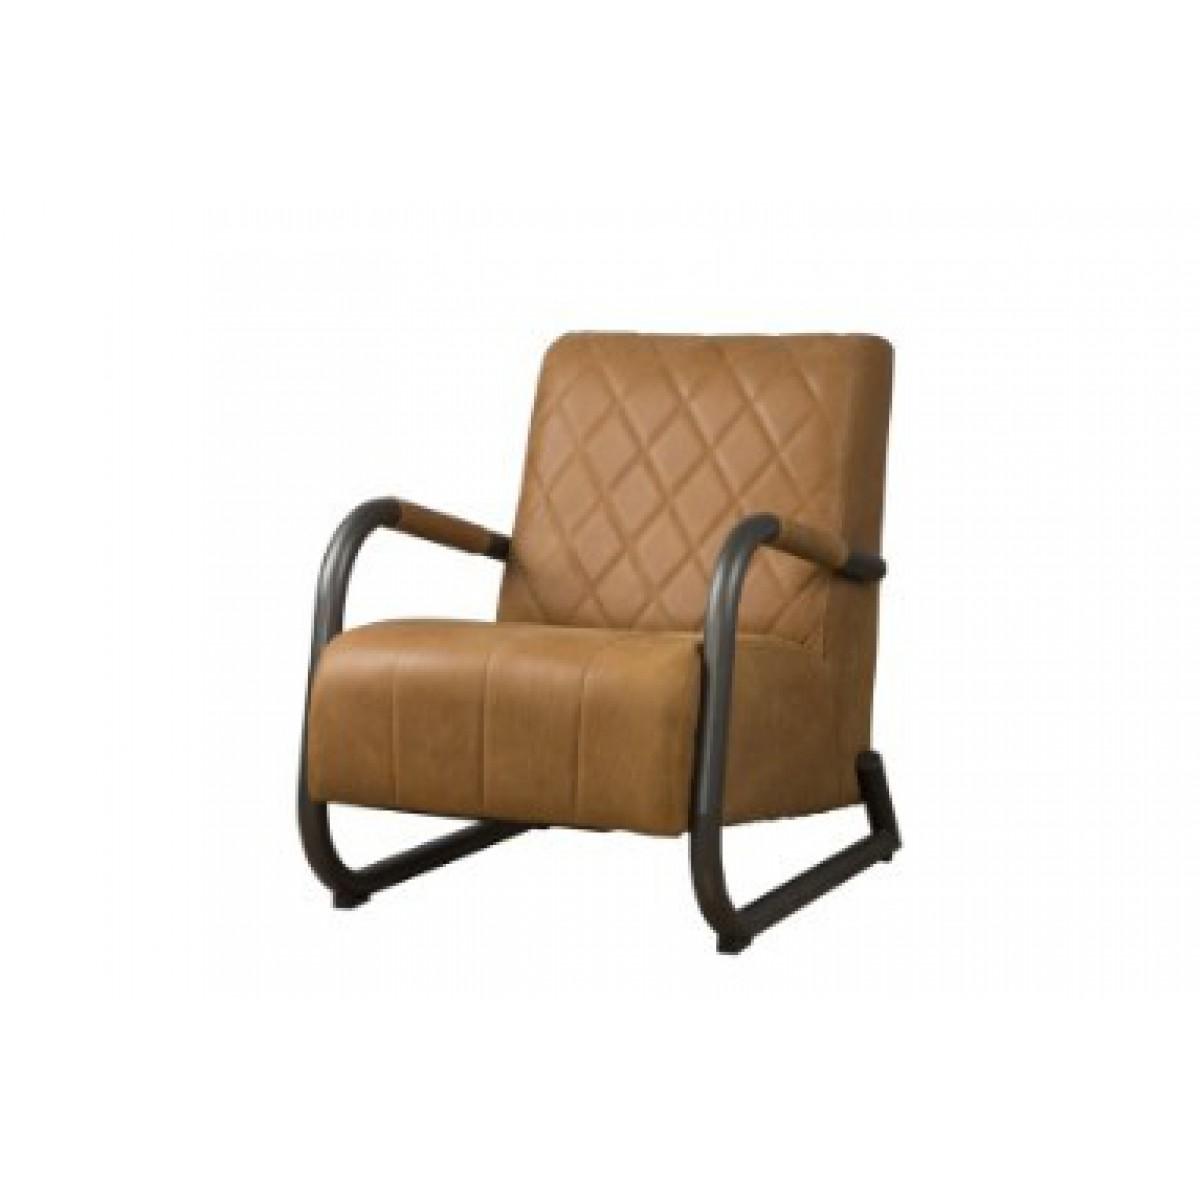 ranch-coffeechair-fauteuil-vintage-leer-rust-lm0012